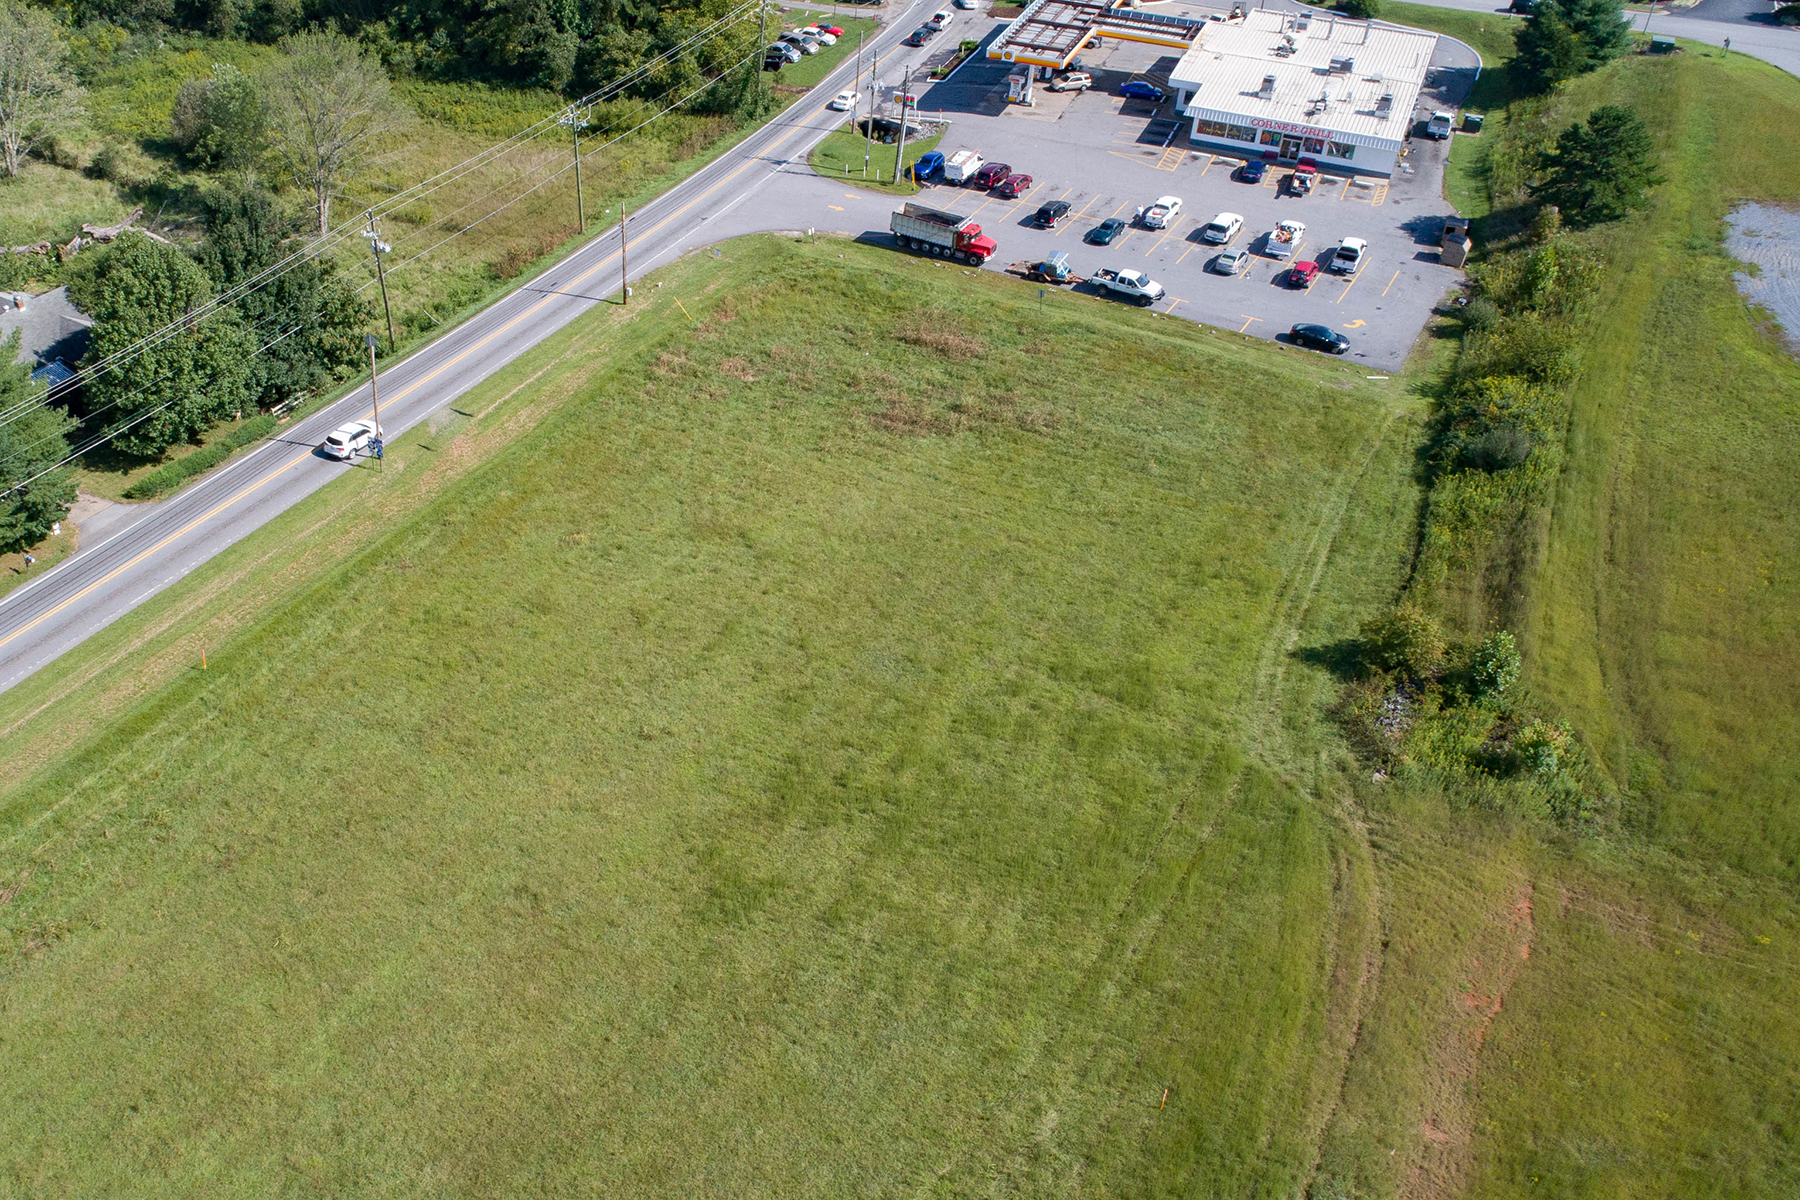 Additional photo for property listing at ARDEN 00  Vista Blvd,  Arden, North Carolina 28704 United States